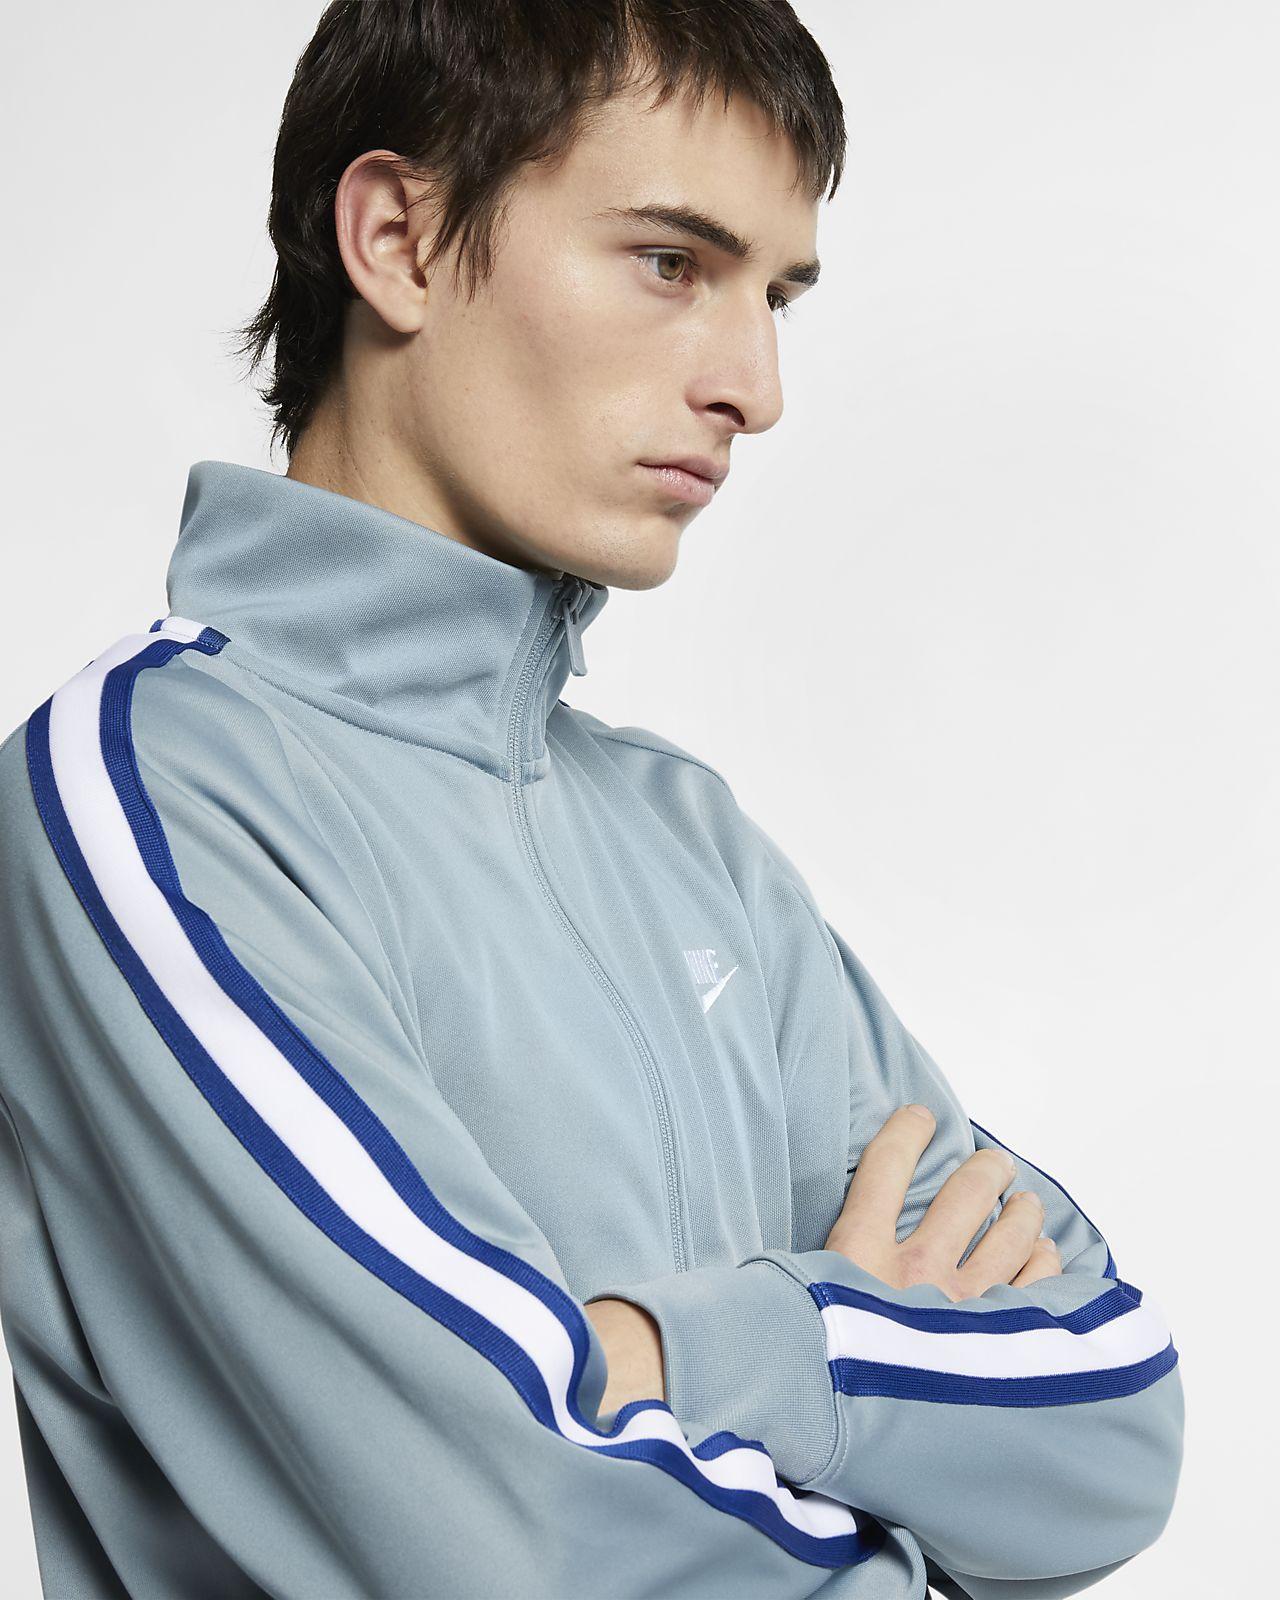 e30dd1b31 Nike Sportswear N98 Knit Warm-Up Jacket - SPORTING GOODS Sports ...